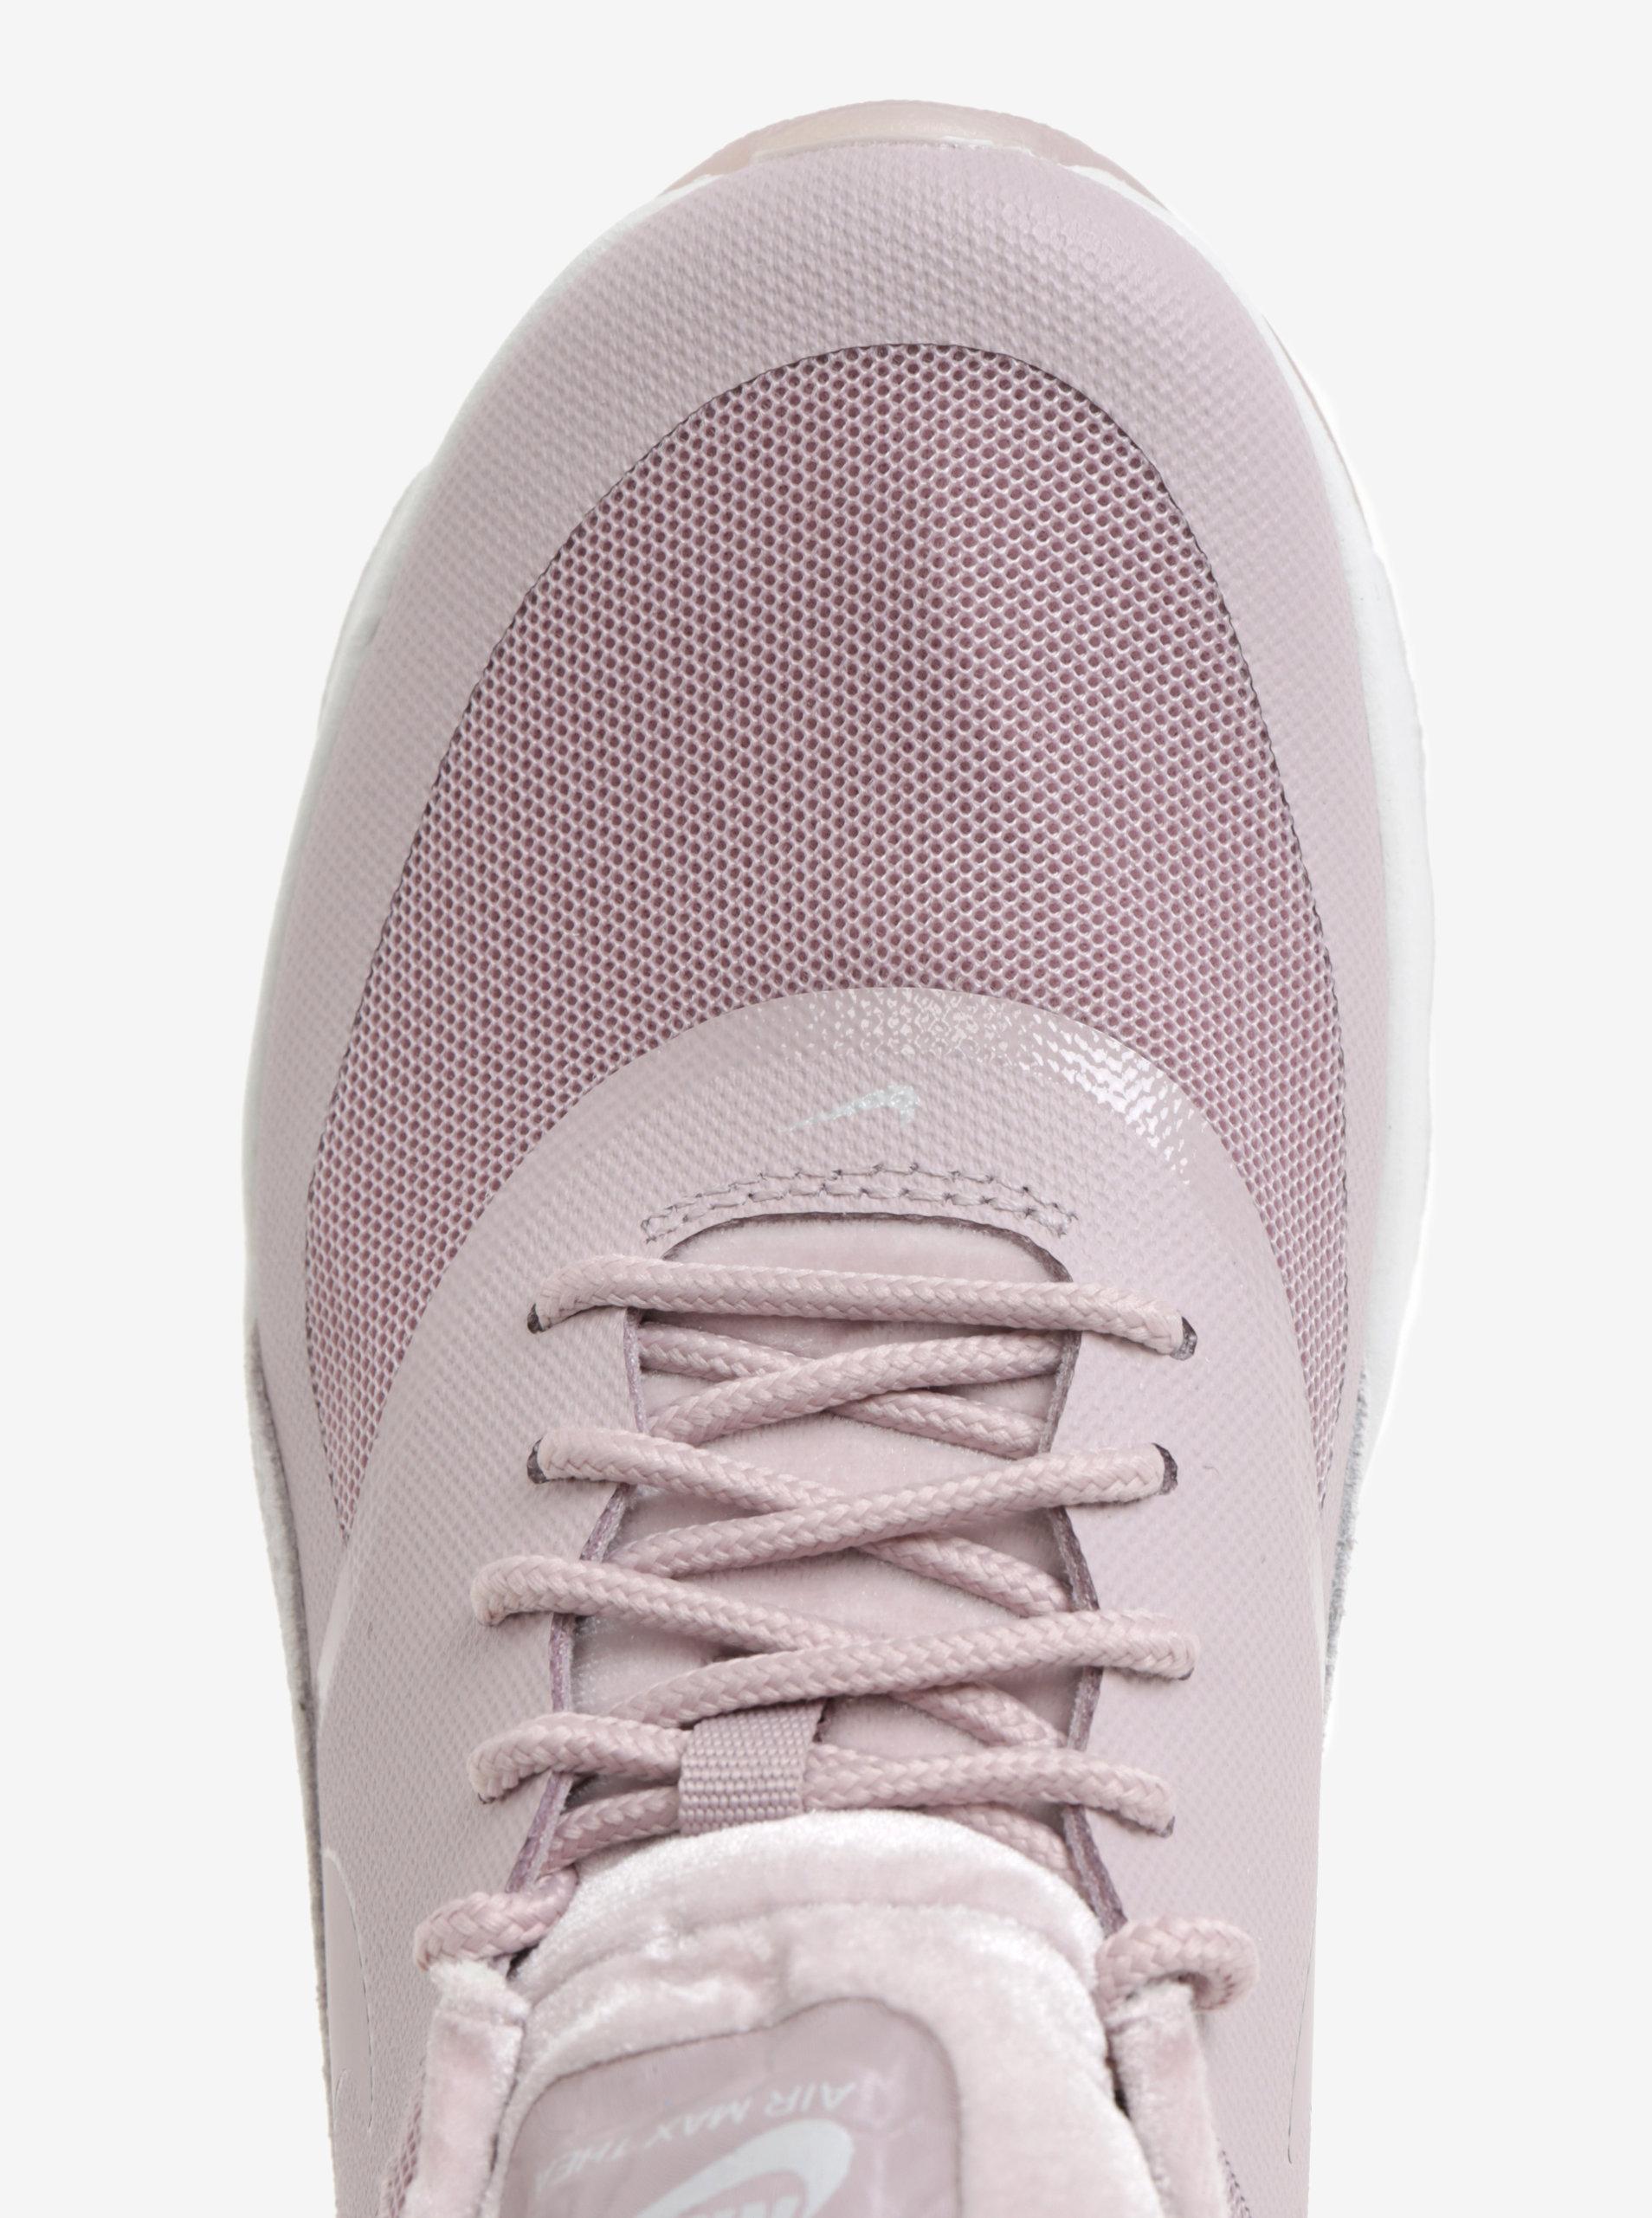 8ea78b23266 Světle růžové dámské tenisky se semišovými detaily Nike Air Max Thea ...